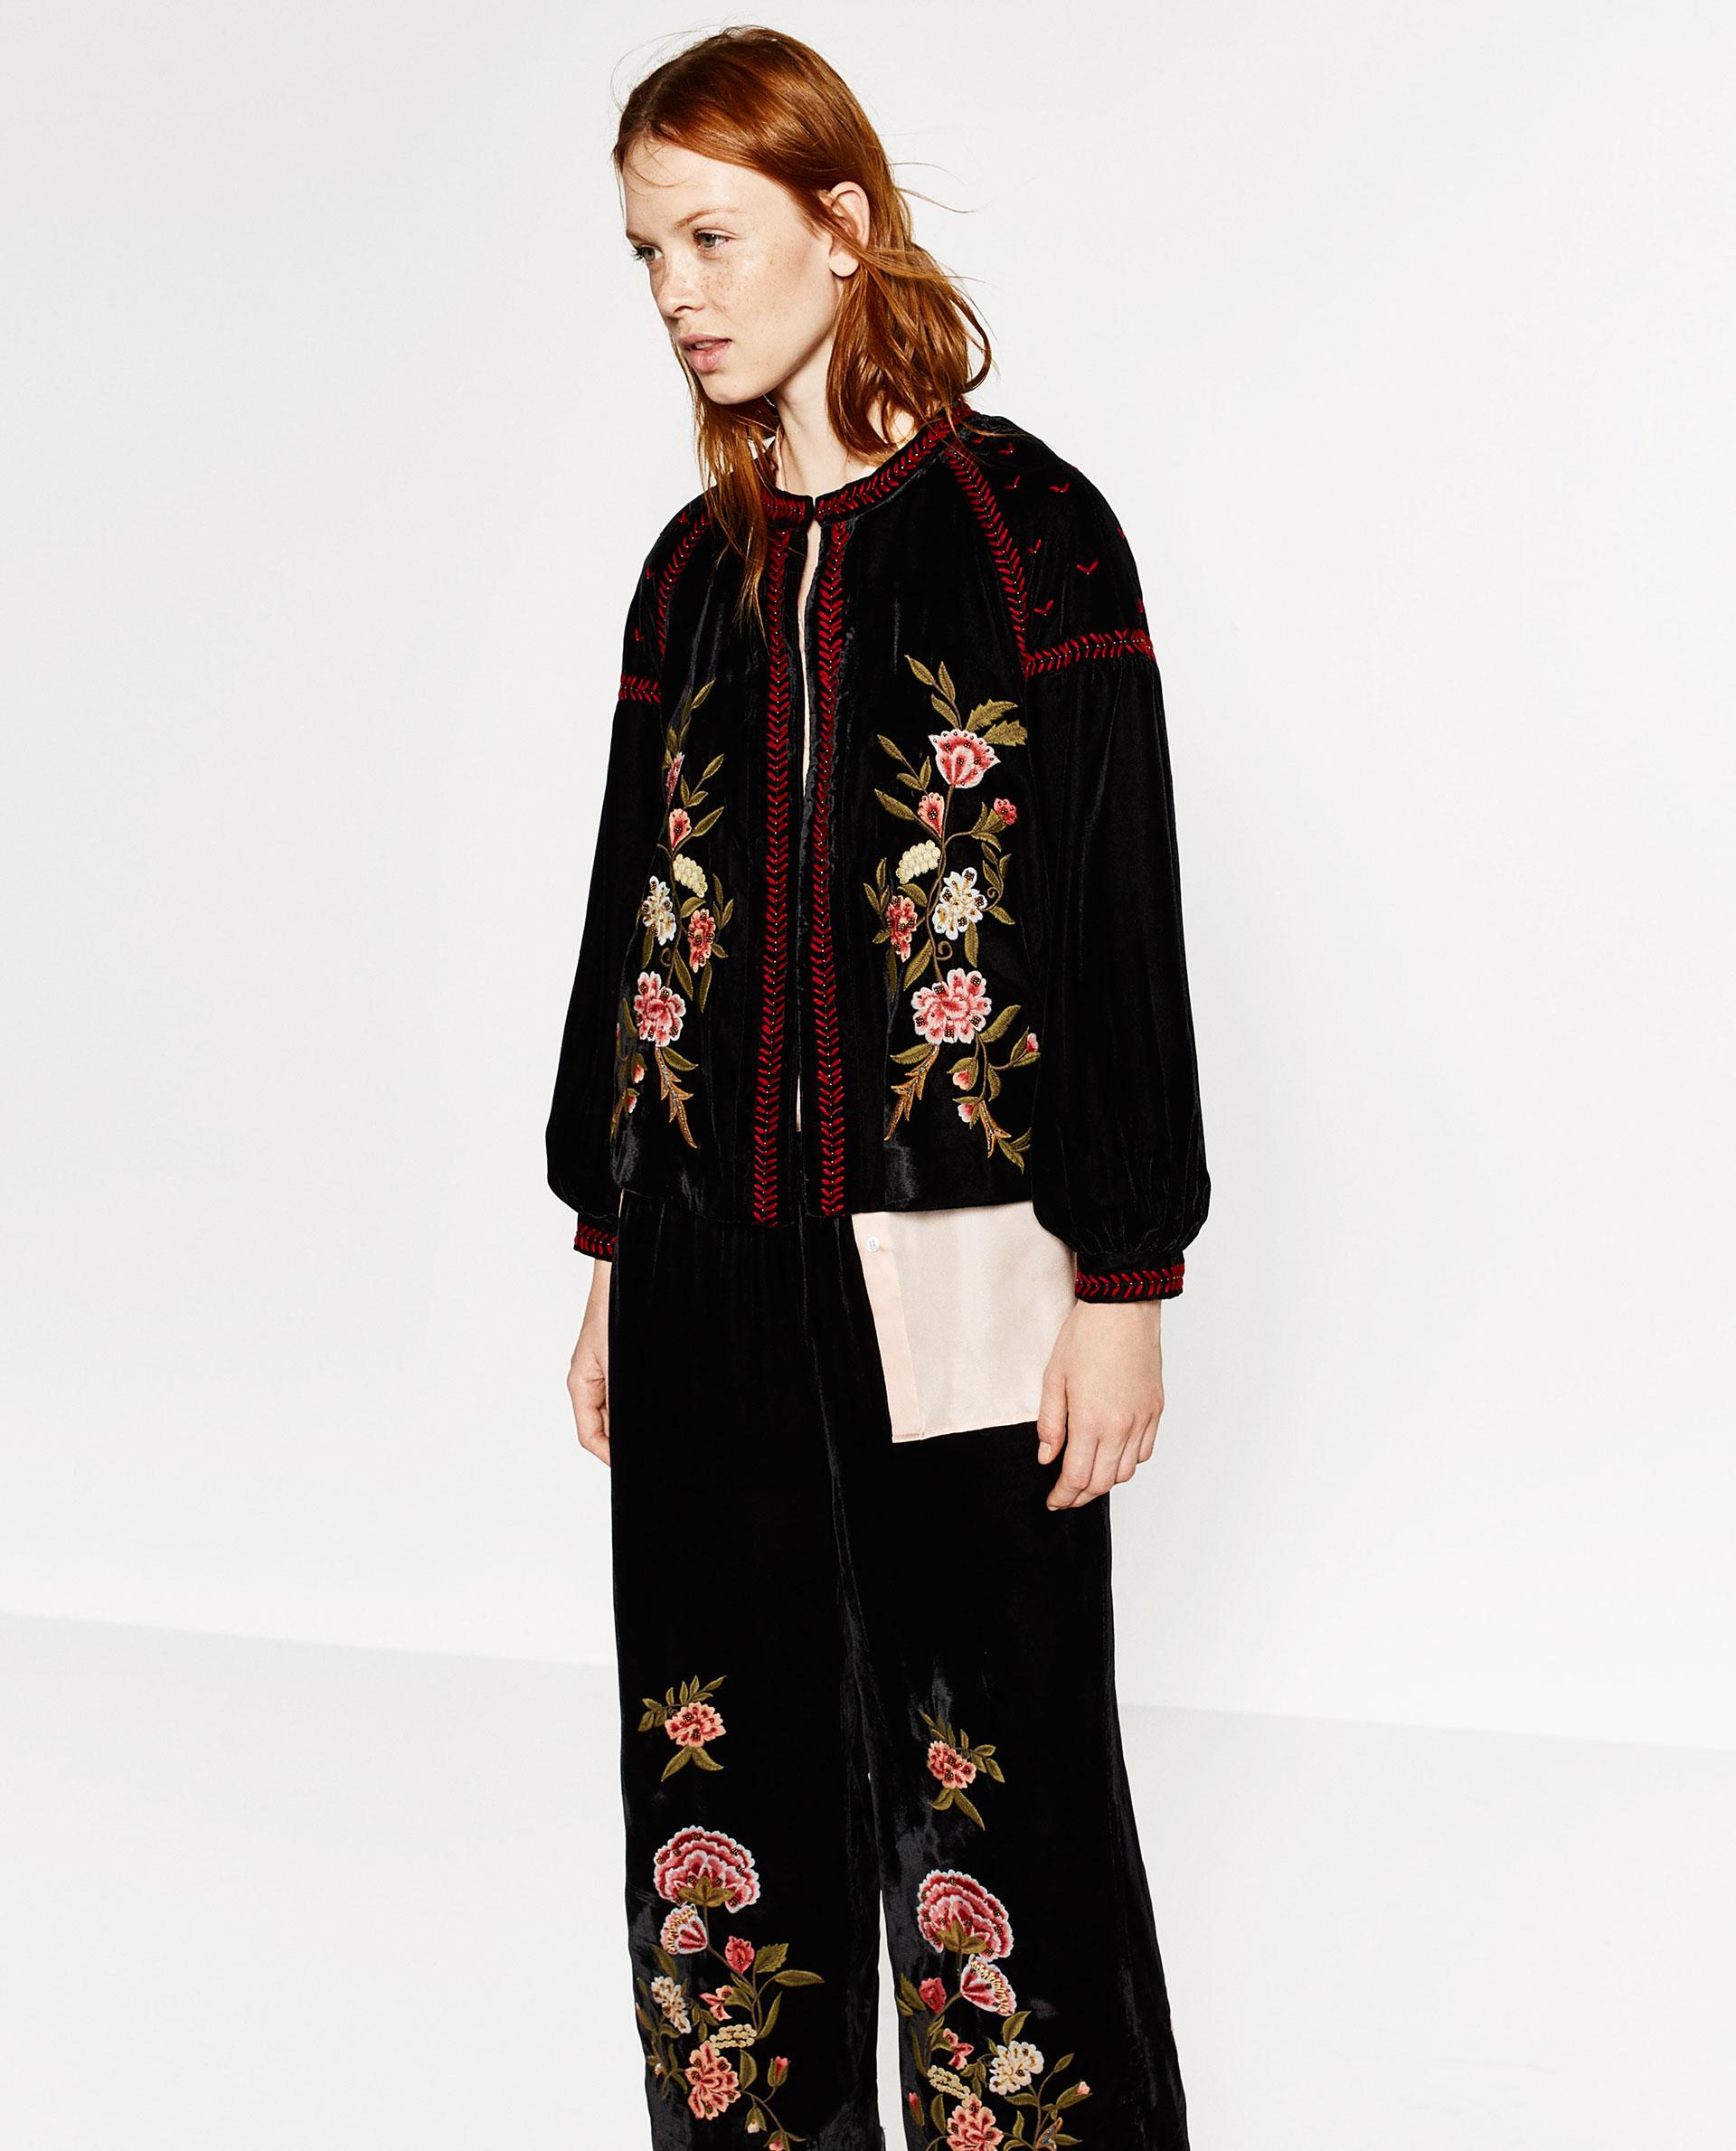 Giacca in velluto con ricami, da Zara